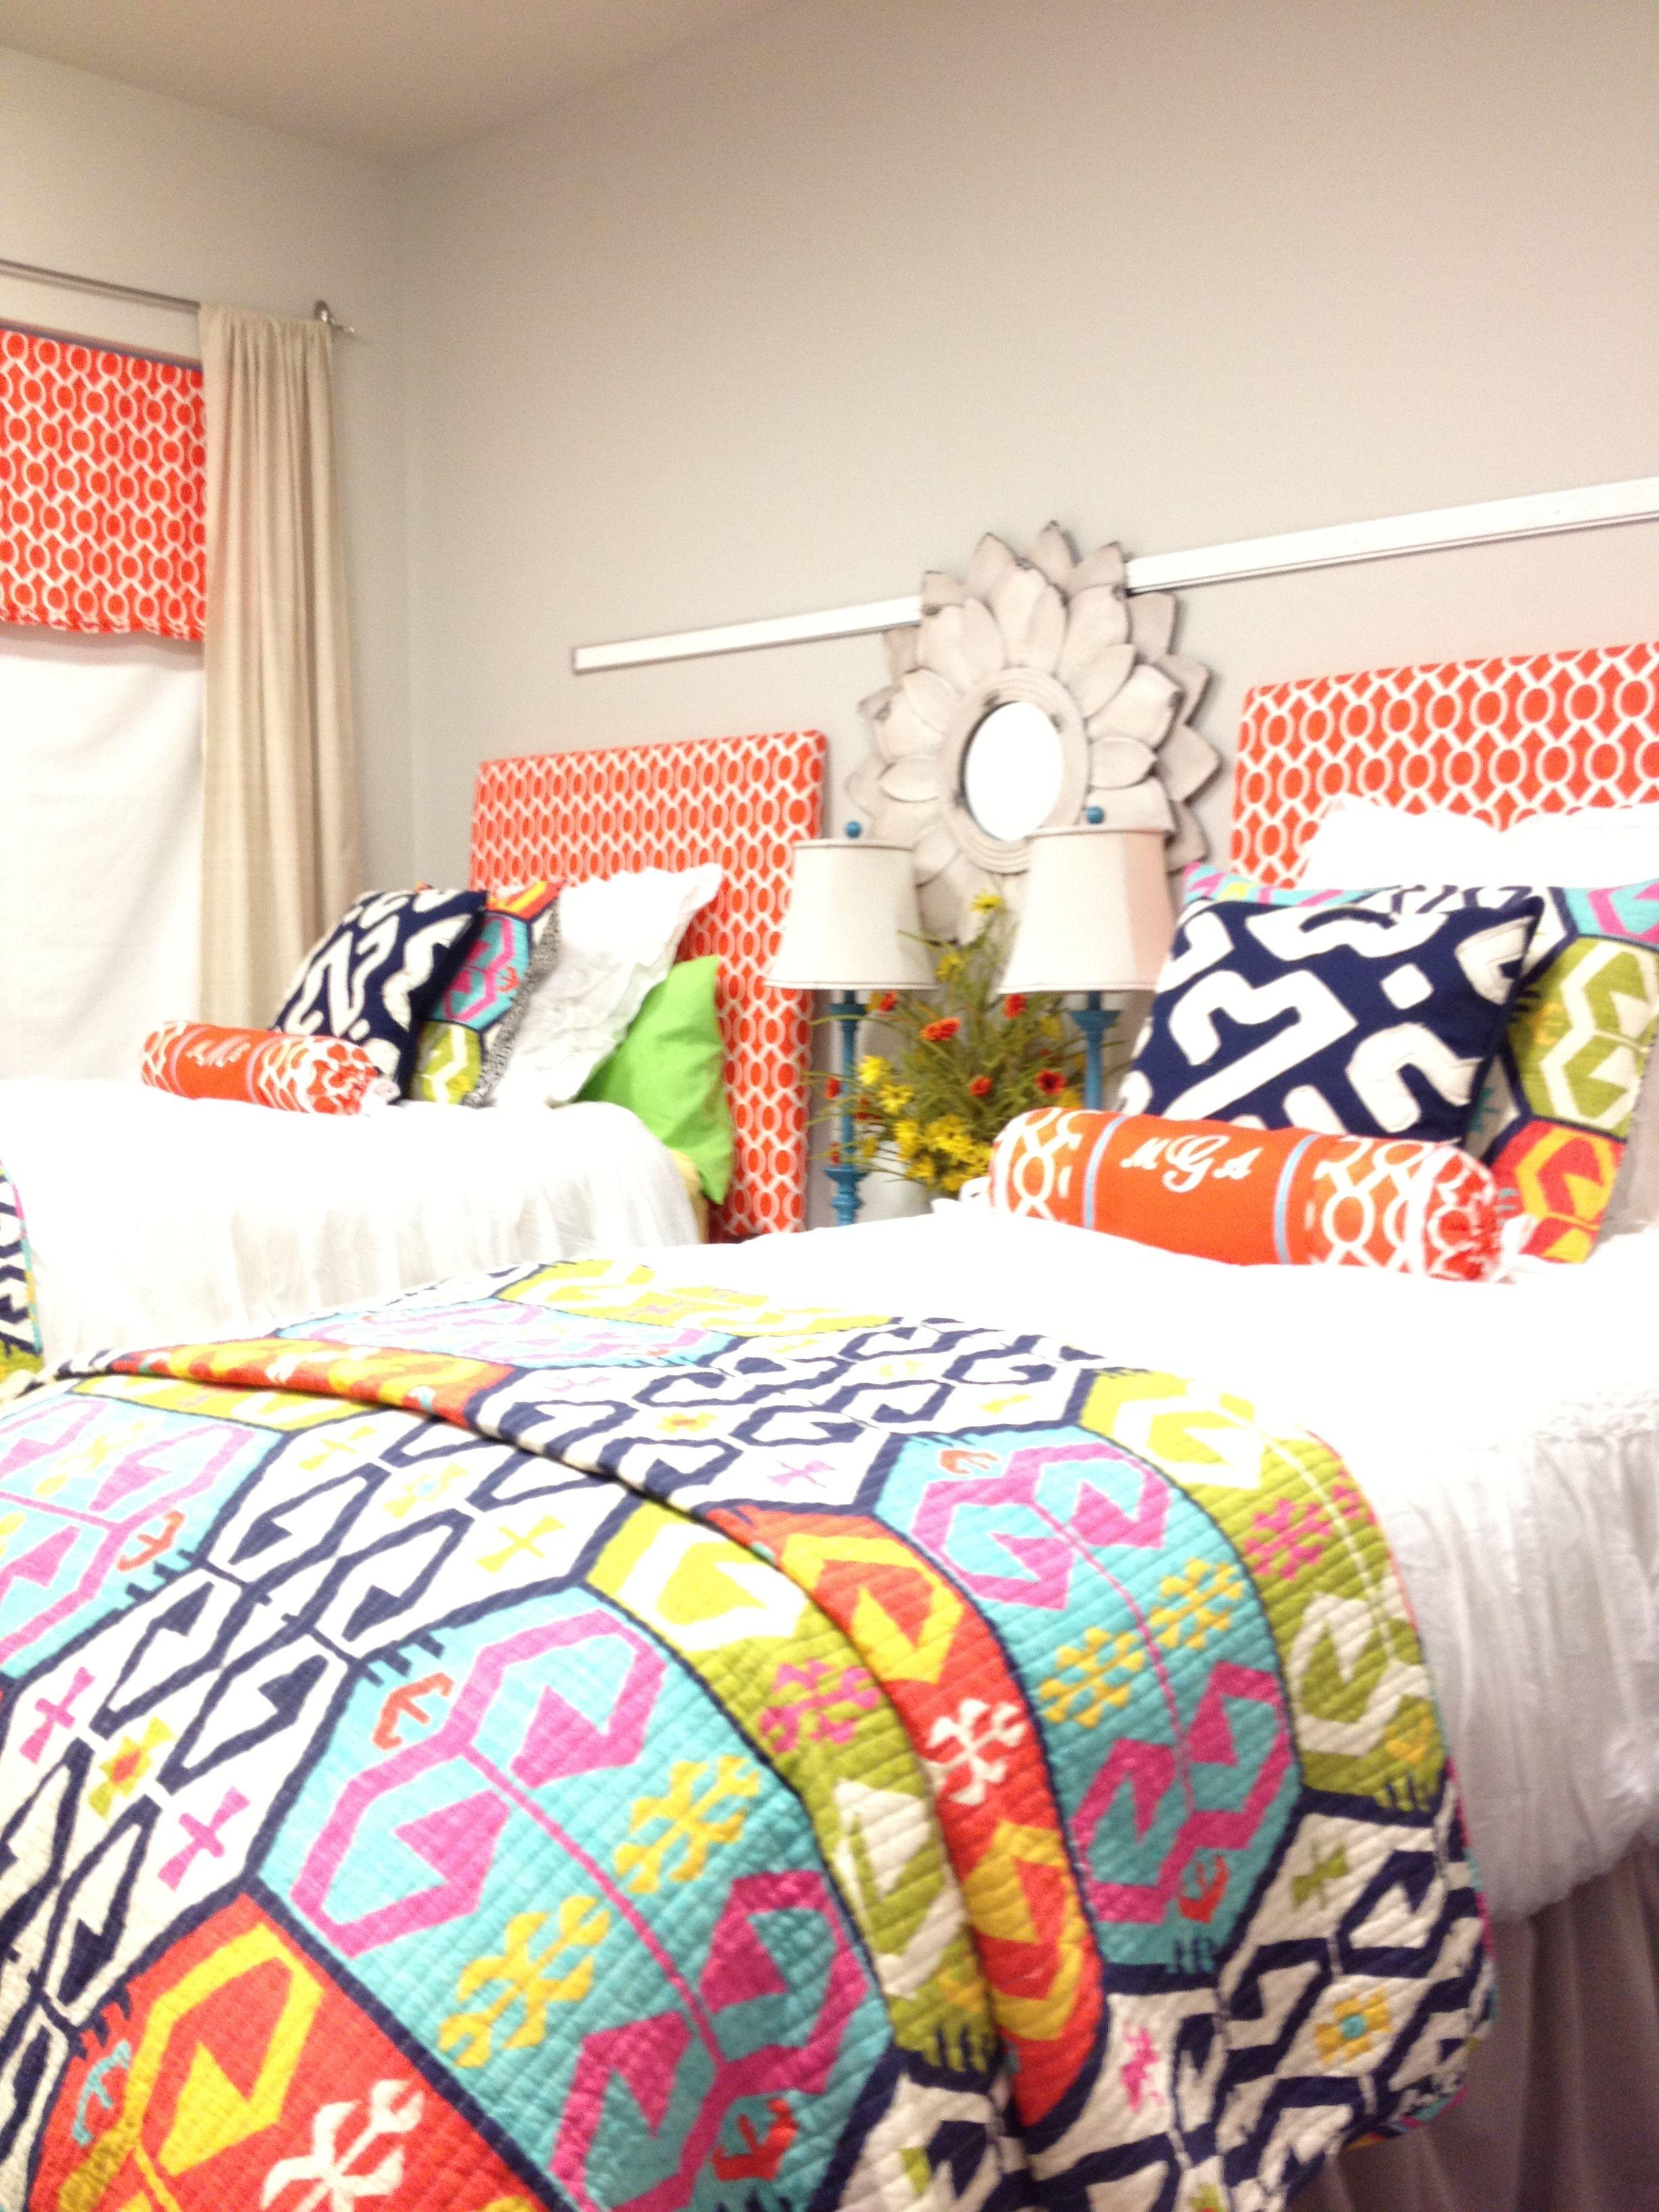 College dorm room decor and bedding. Mississippi state university  @Mclean Skalak